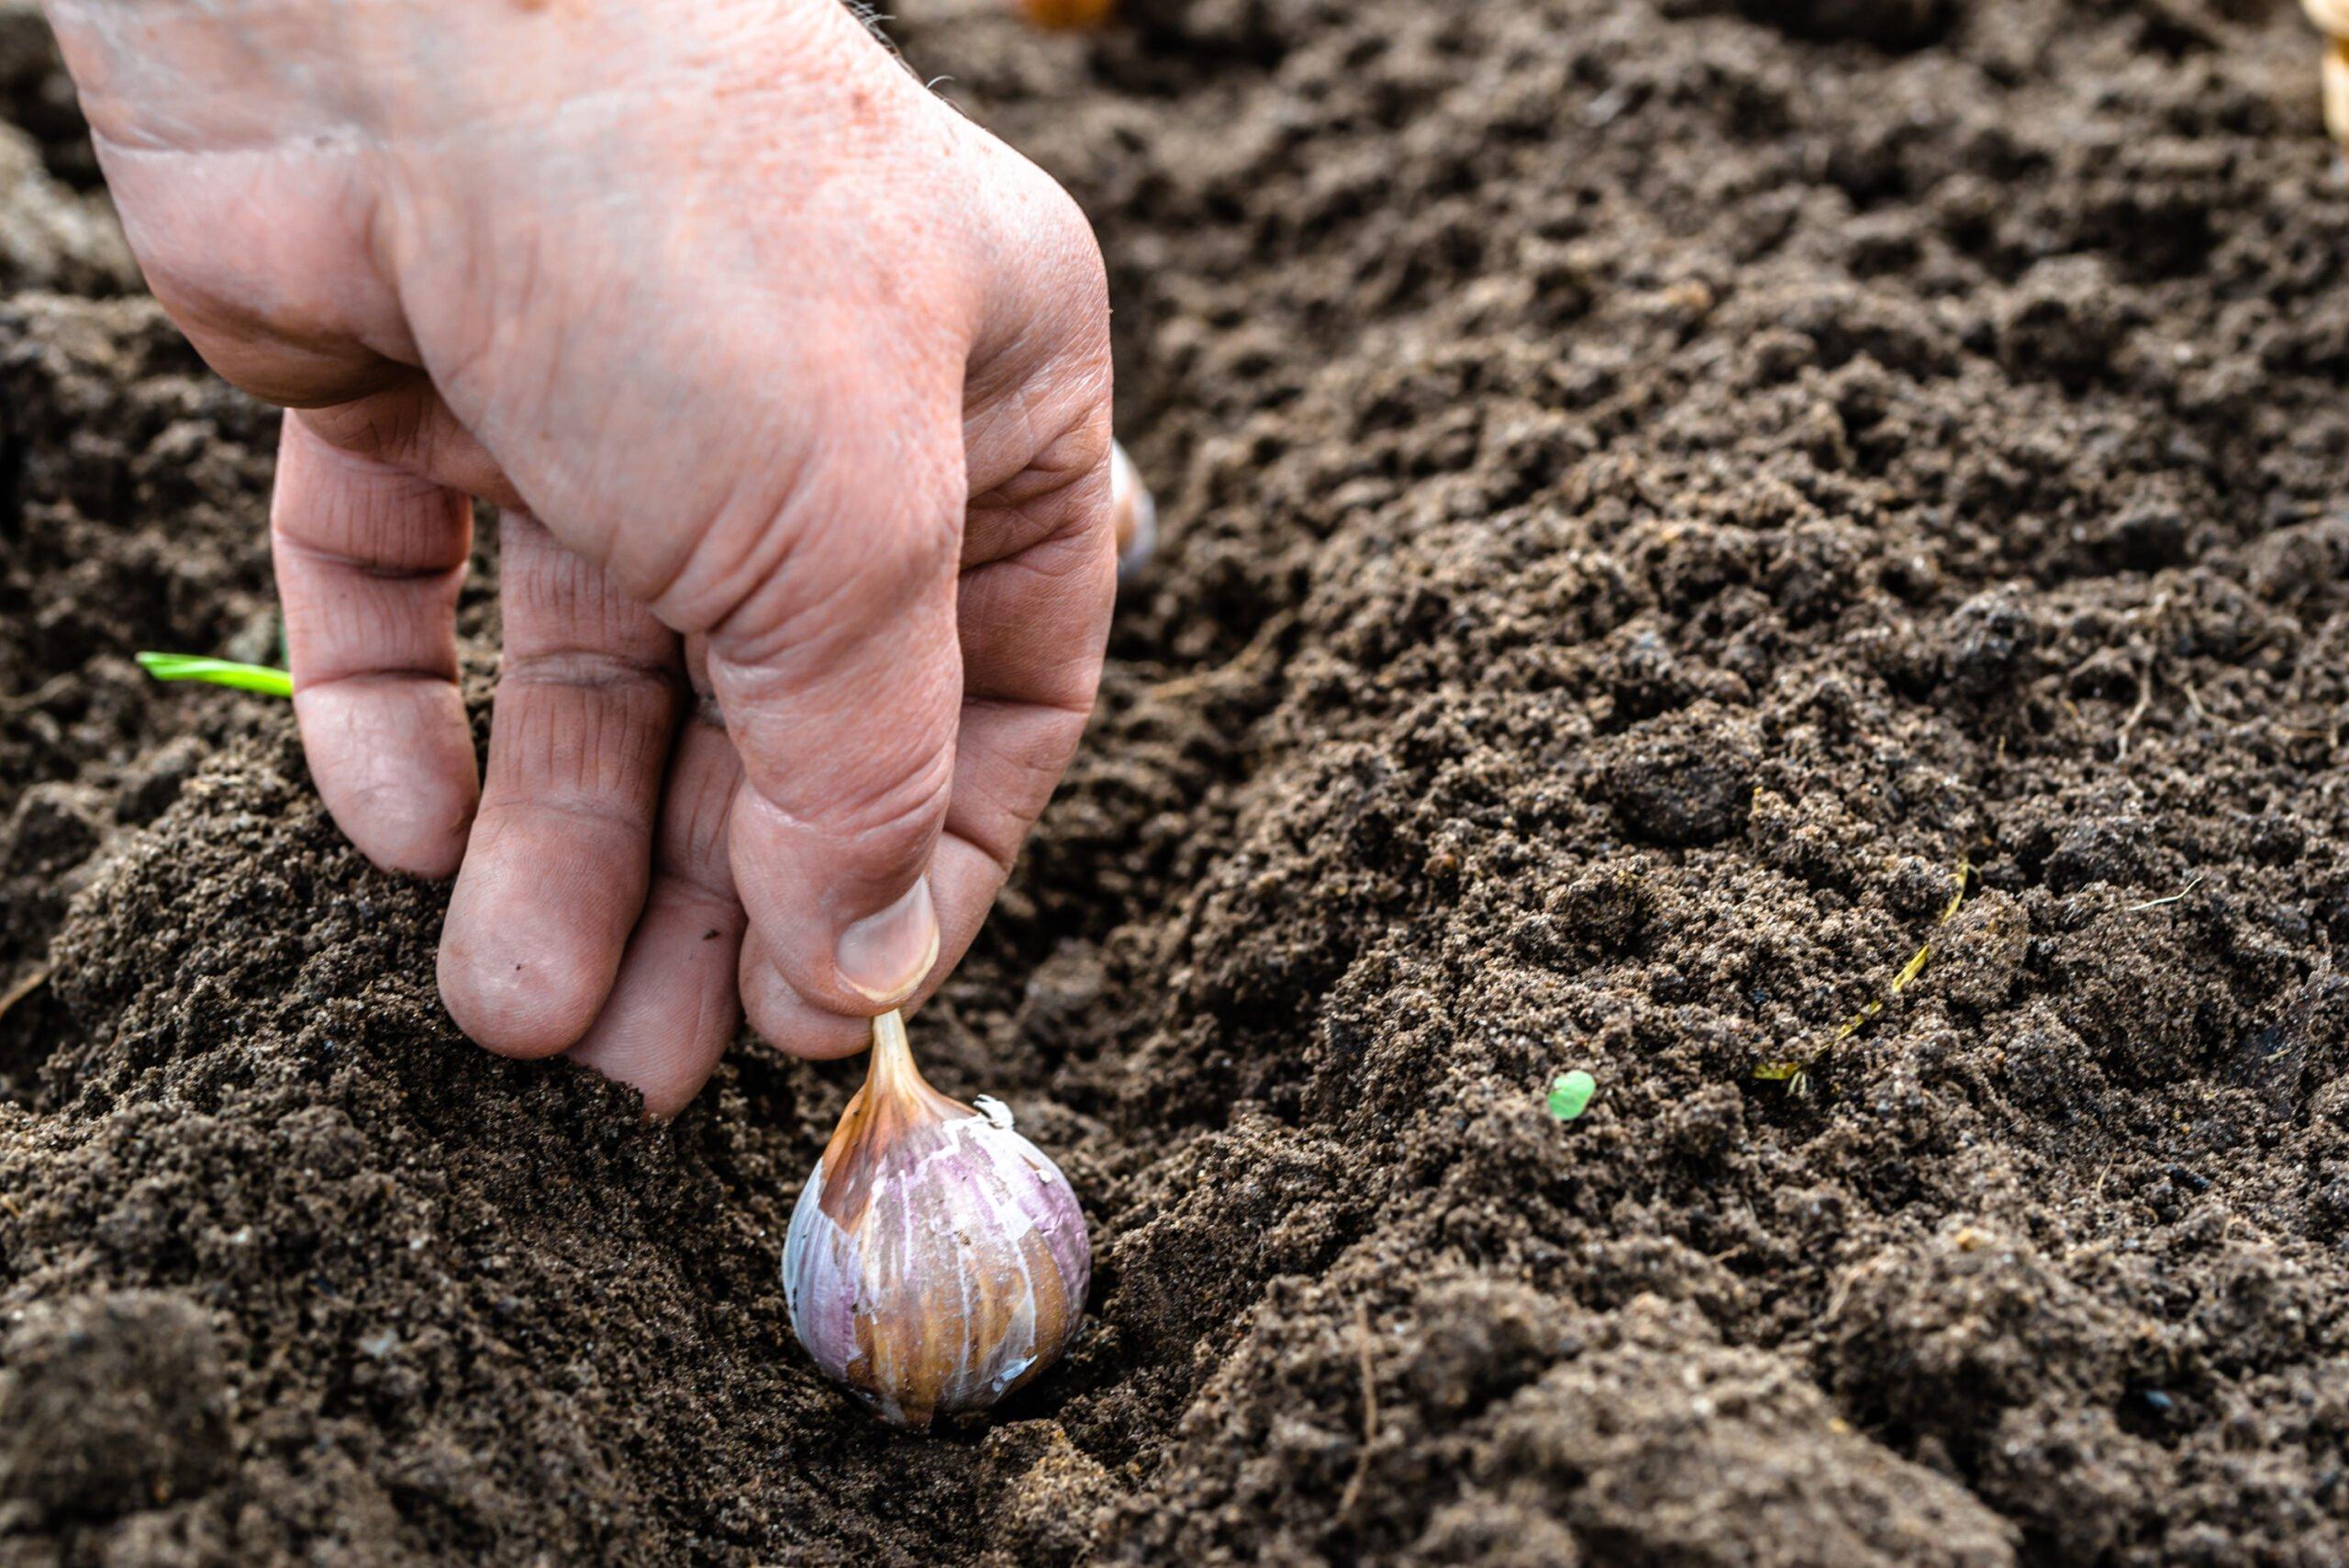 Hand planting garlic cloves